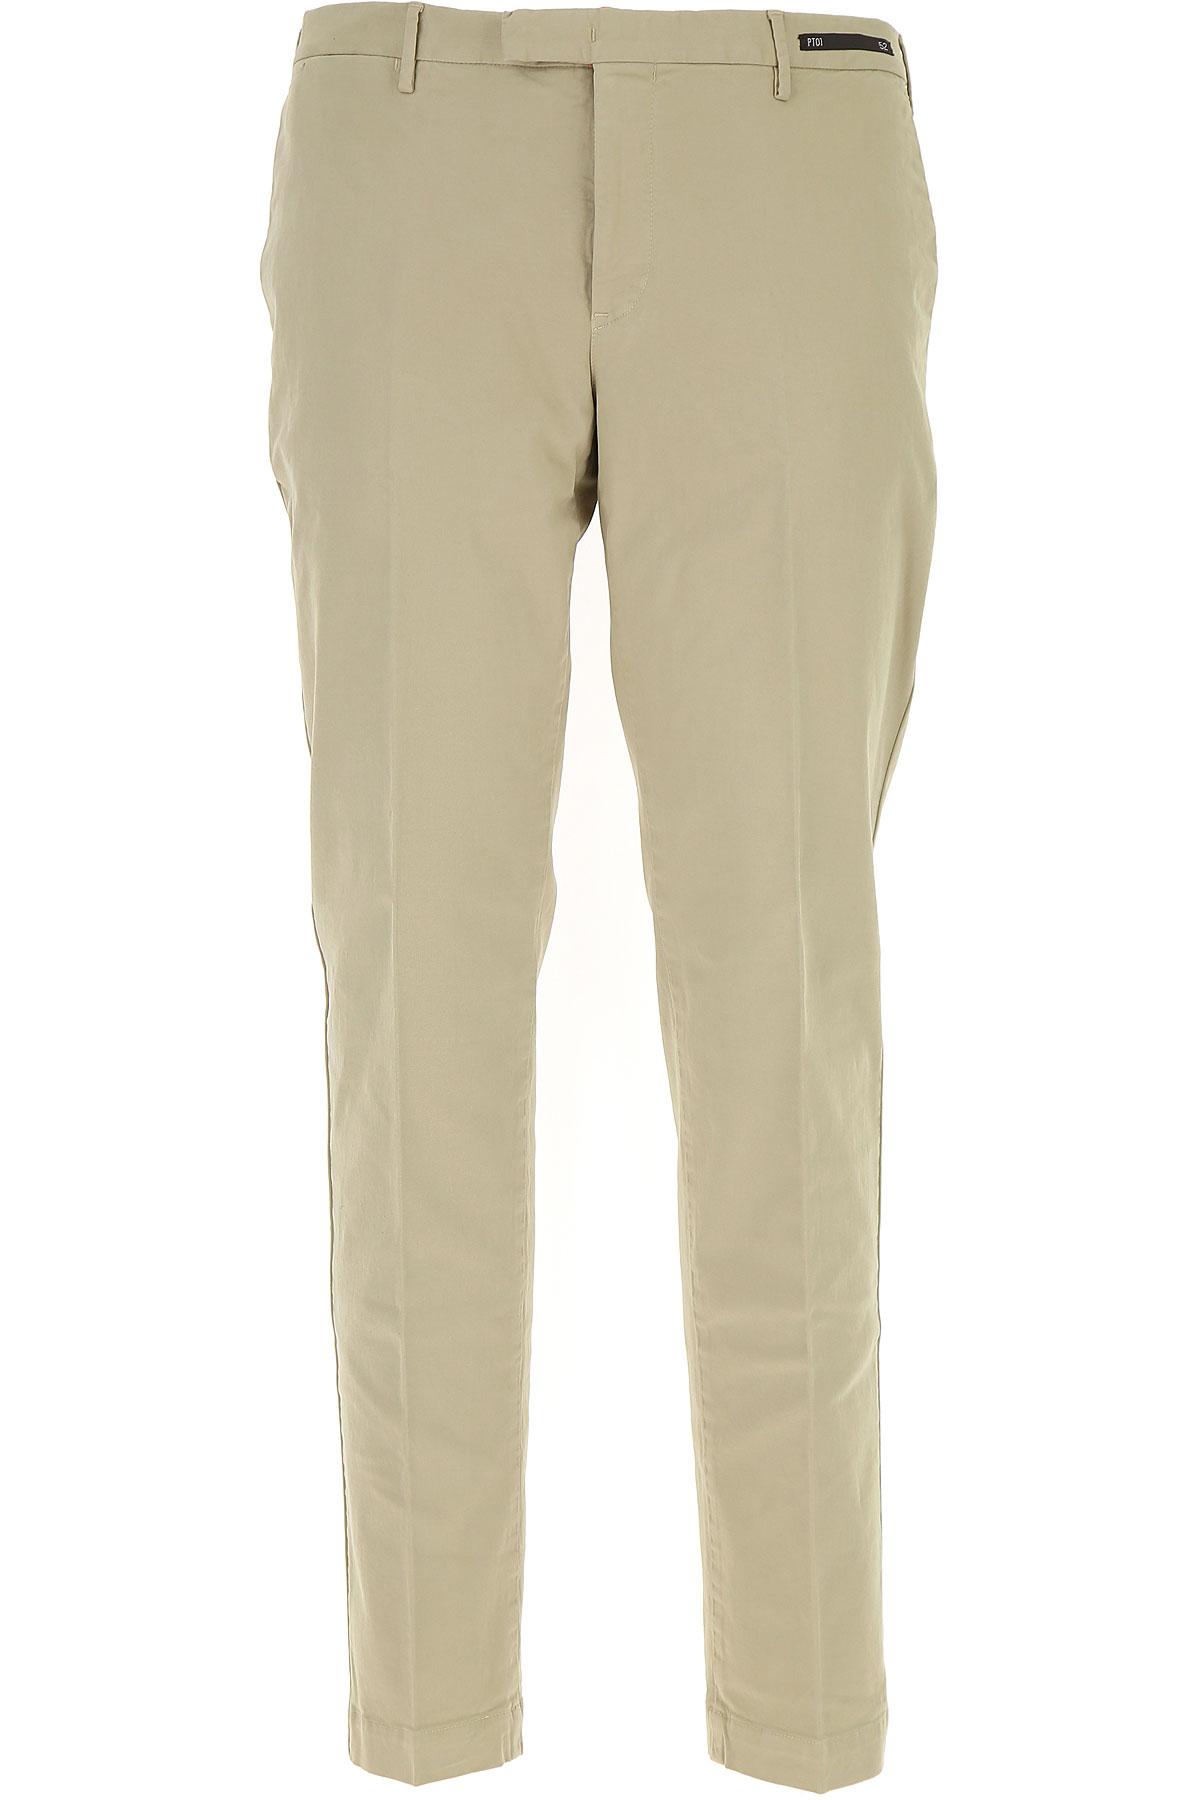 Image of PT01 Pants for Men, Beige, Cotton, 2017, 30 31 32 33 34 36